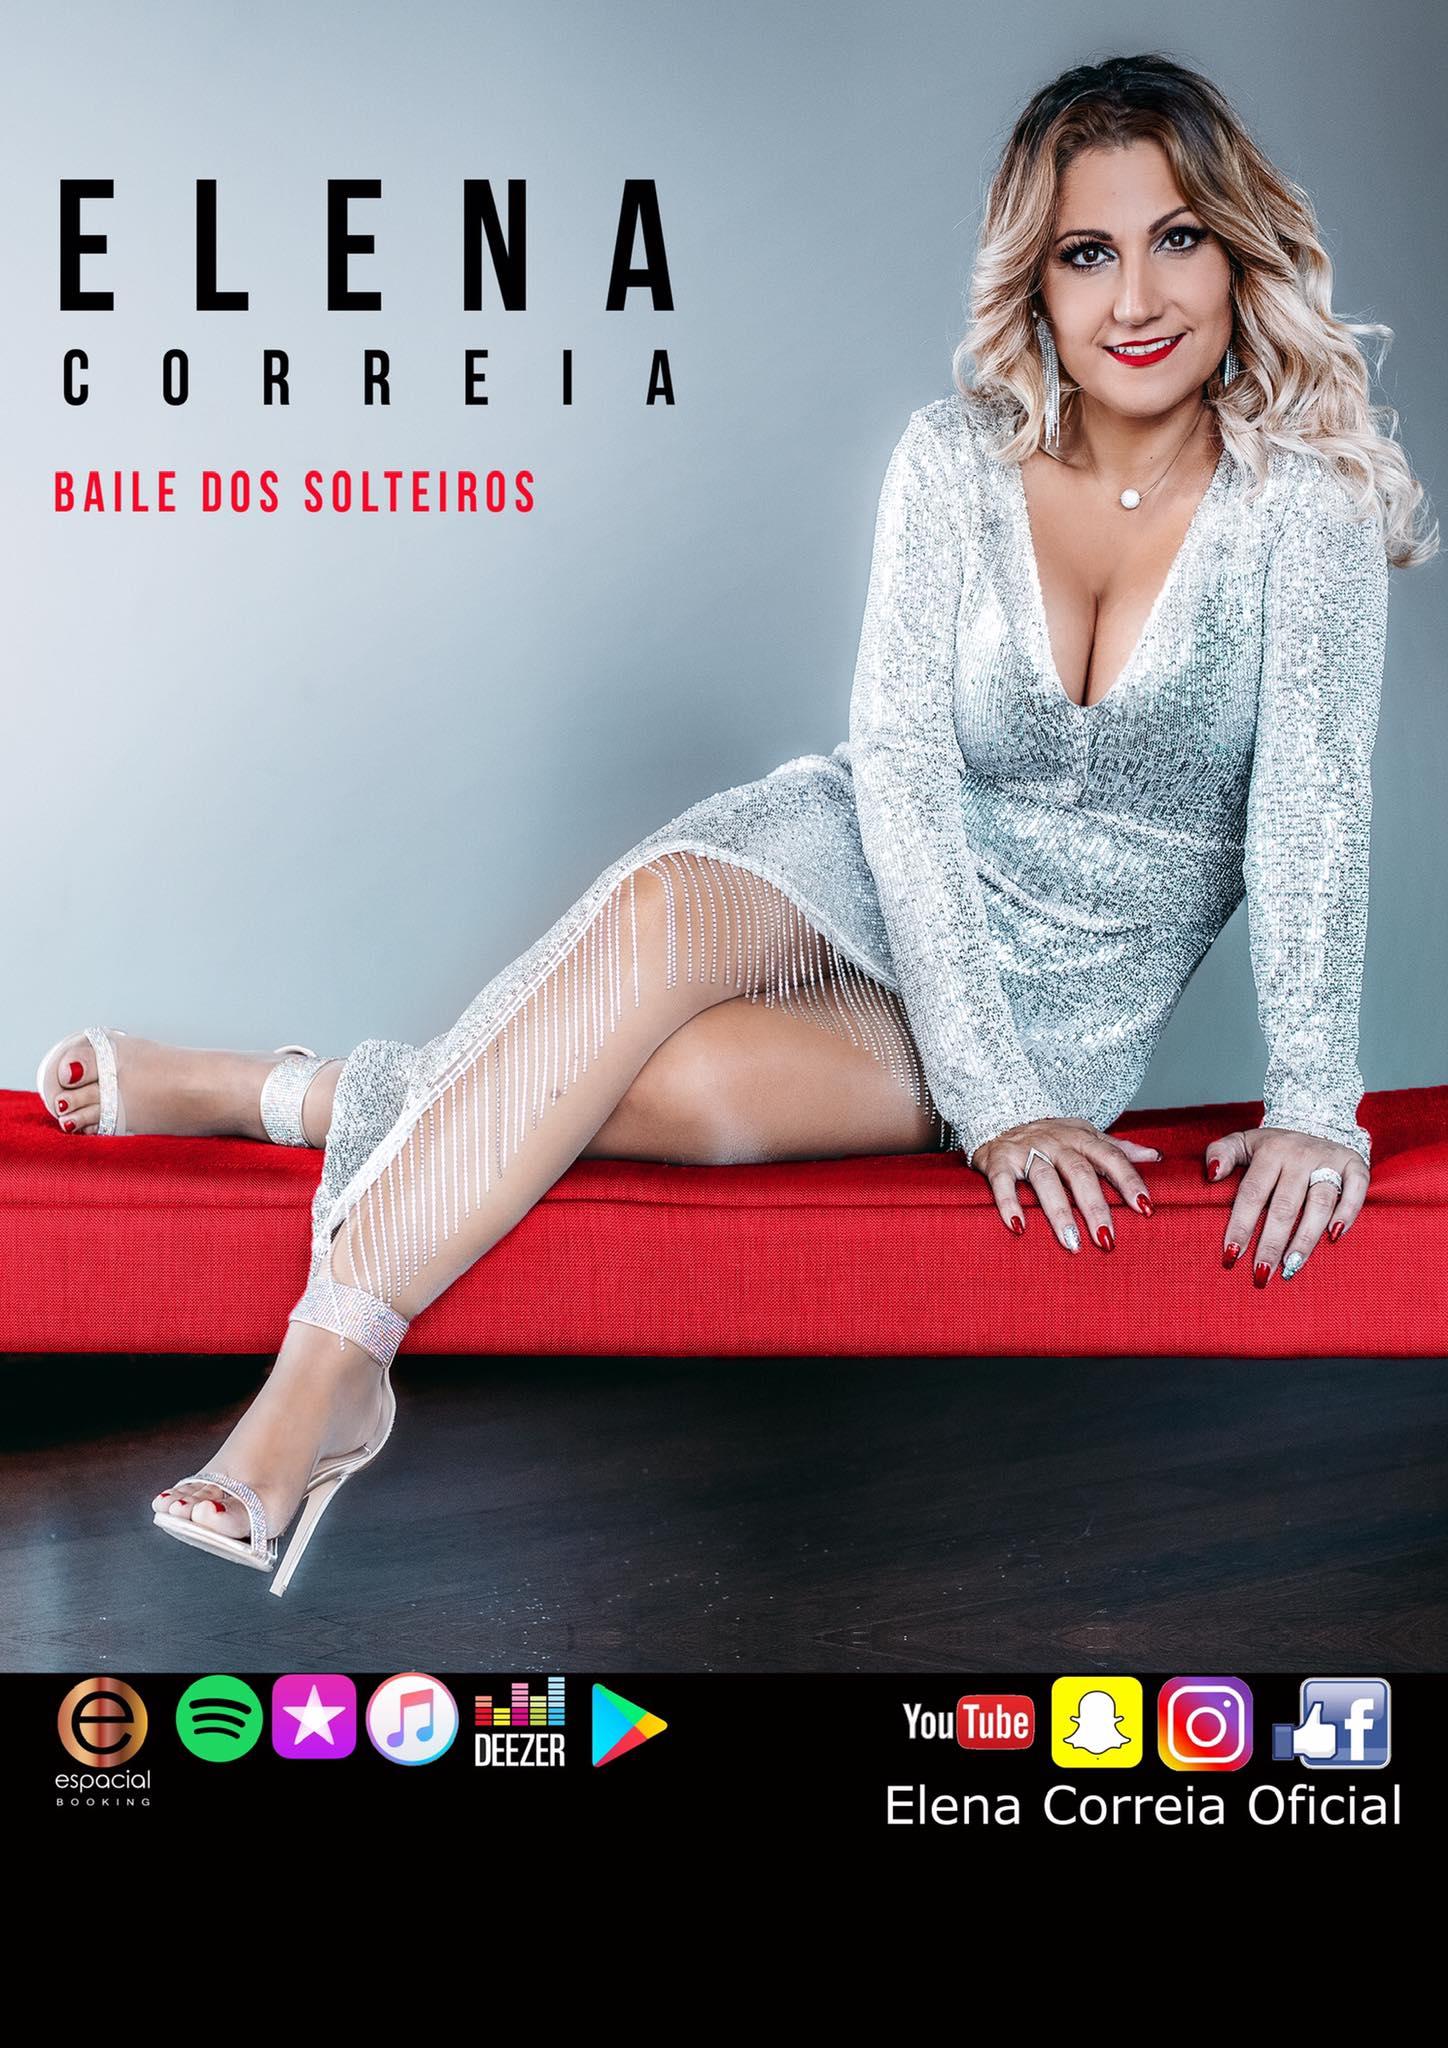 Elena-Correia-1 FOTO-GALERIA